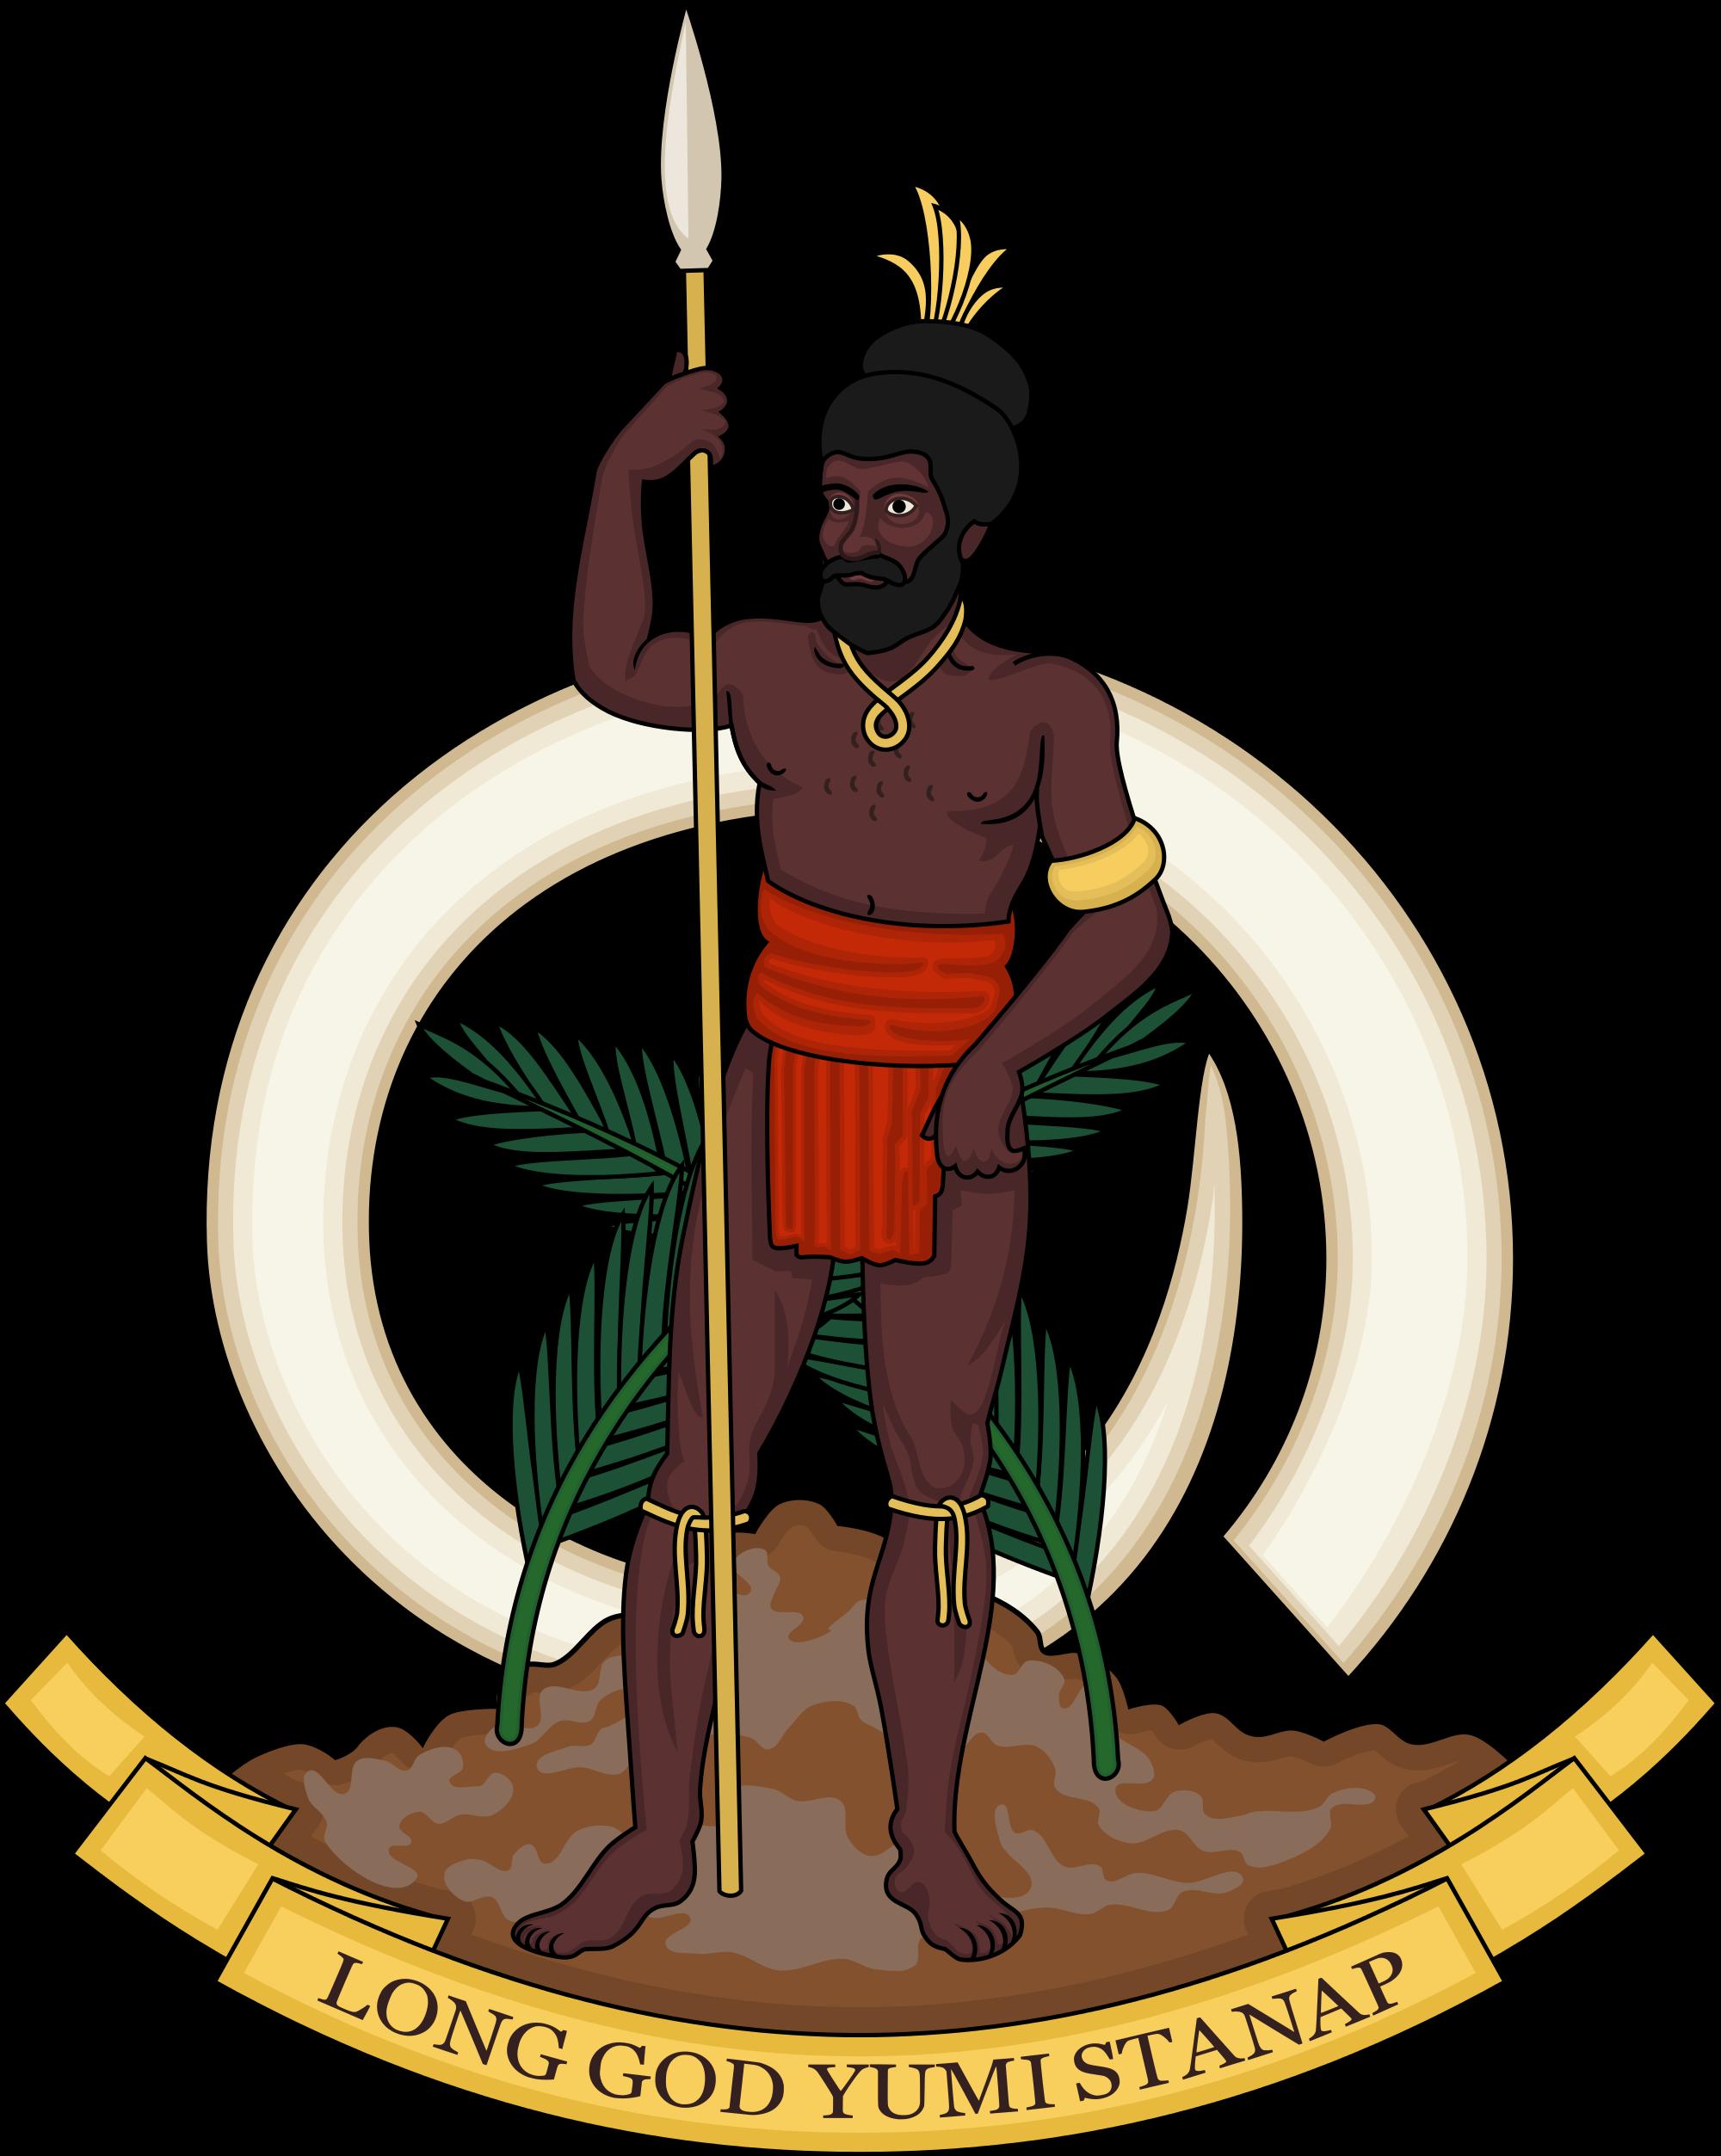 Warrior clipart polynesian. Coat of arms vanuatu